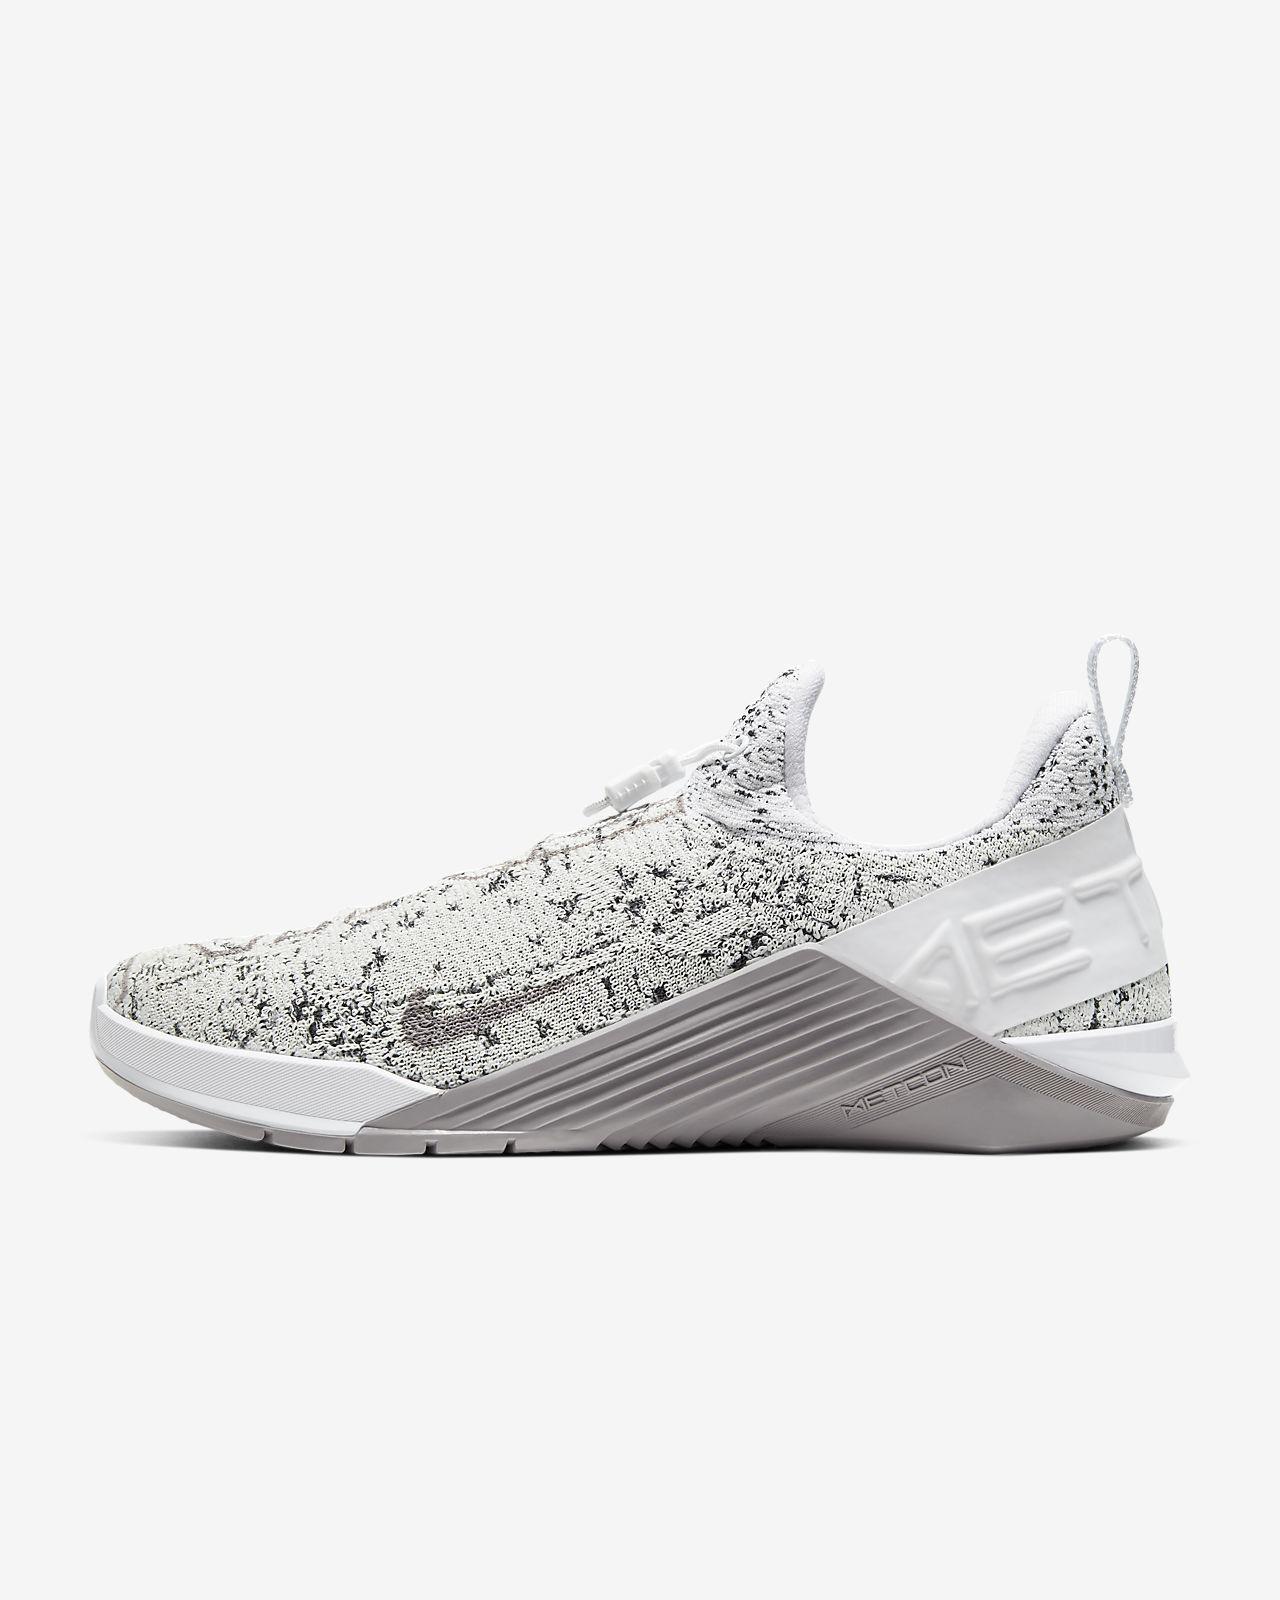 Tr?ningssko Nike React Metcon f?r kvinnor